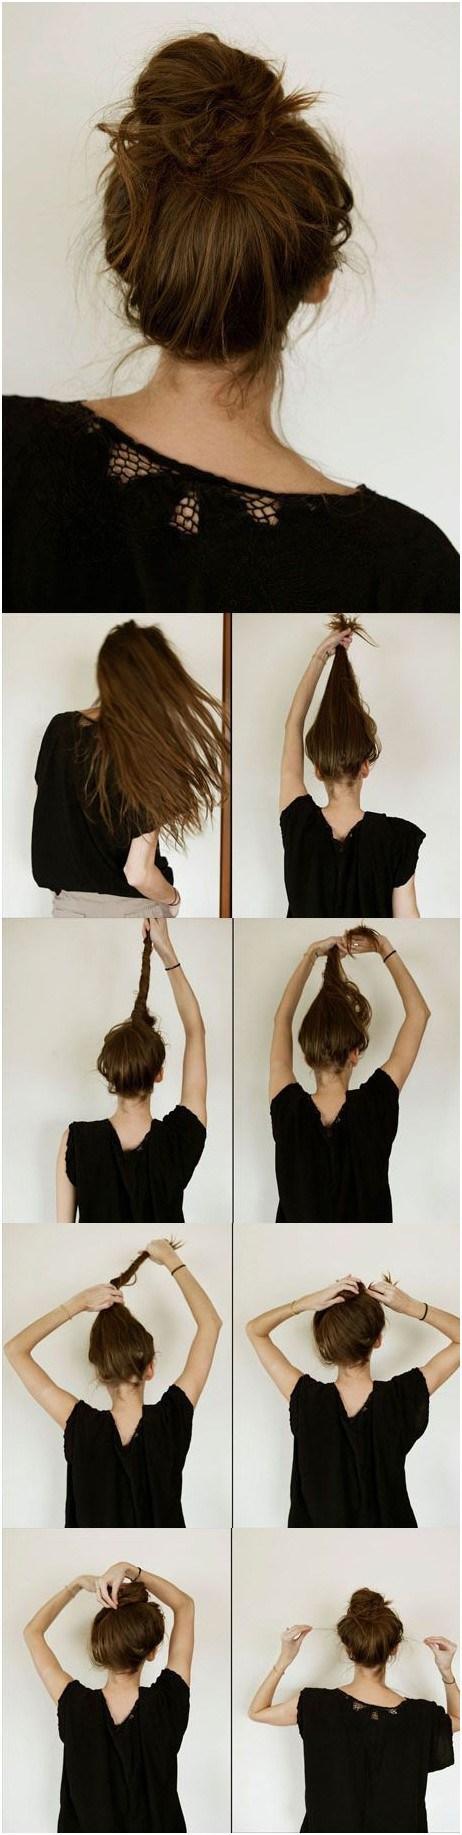 Hair Tutorials for Long Hair and Medium Length Hair